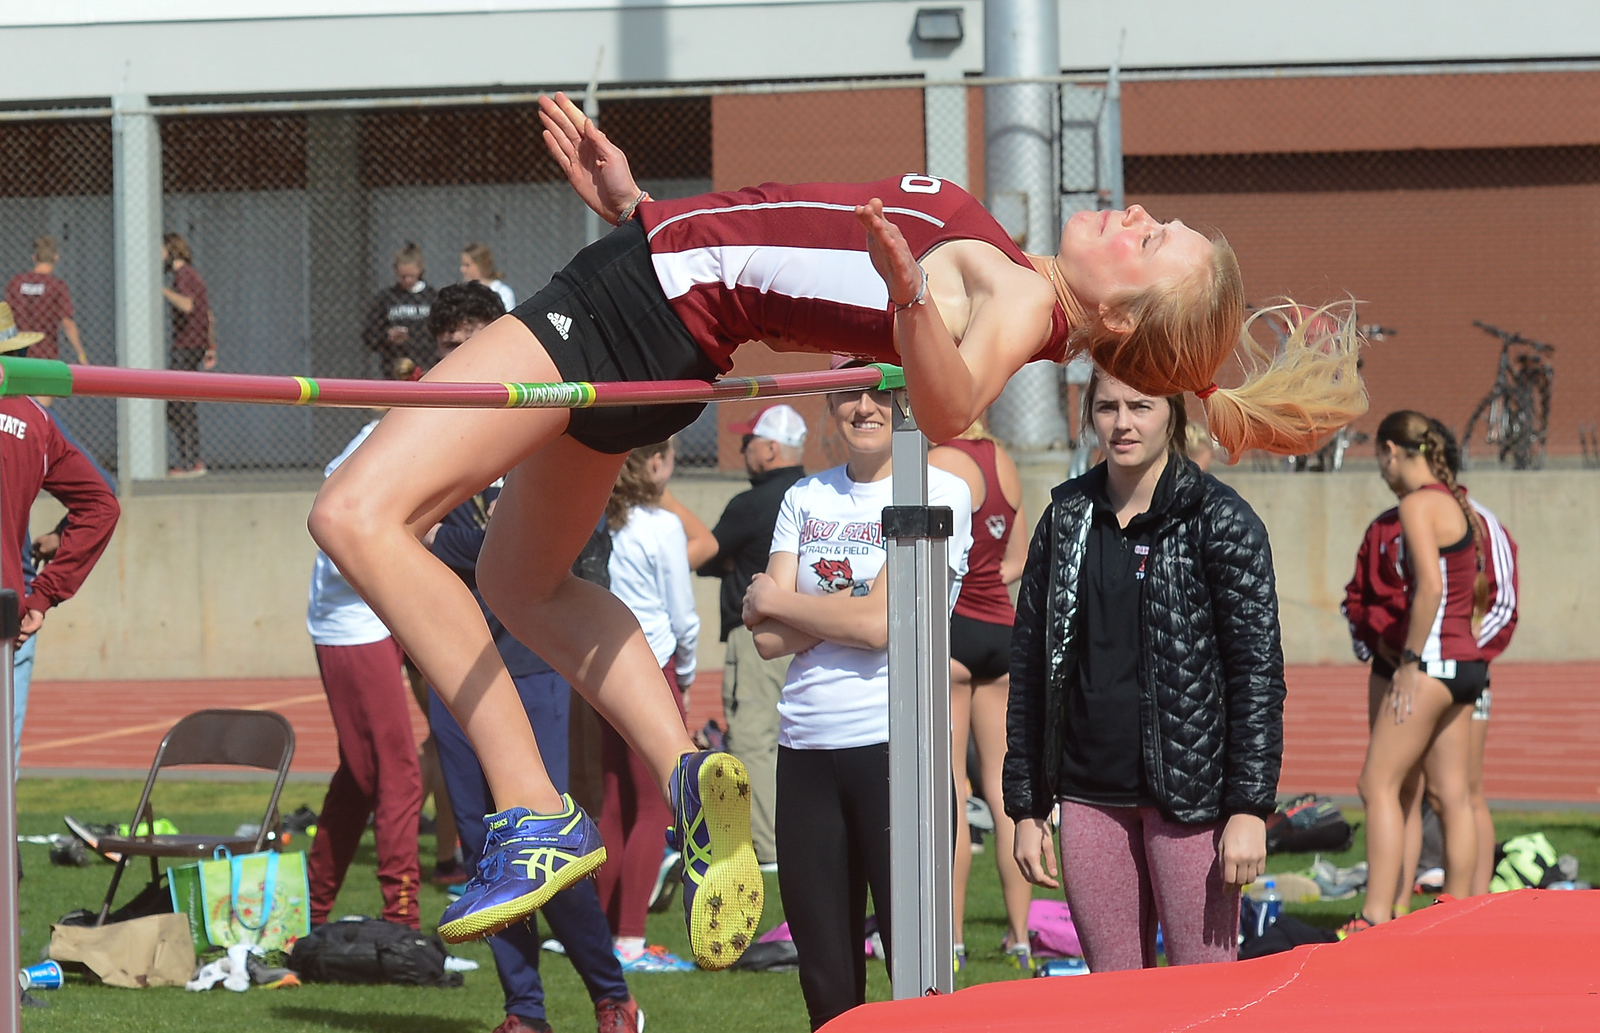 Heather Pendleton high jumps, Saturday, March 10, 2018, in Chico, California. (Carin Dorghalli -- Enterprise-Record)